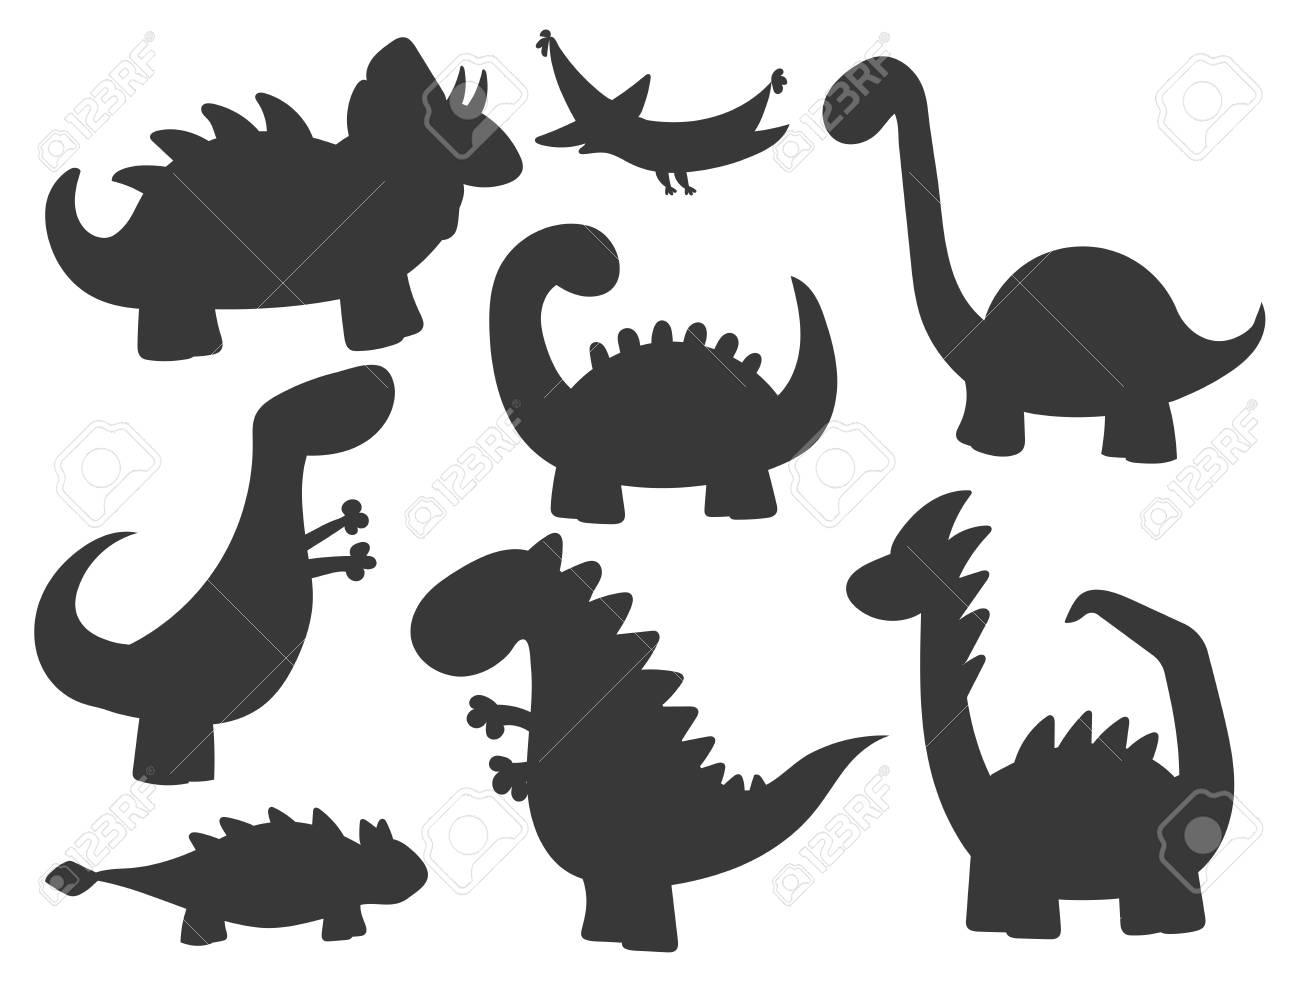 Cartoon dinosaurs vector illustration monster silhouette animal dino prehistoric character reptile predator jurassic fantasy dragon - 87921094